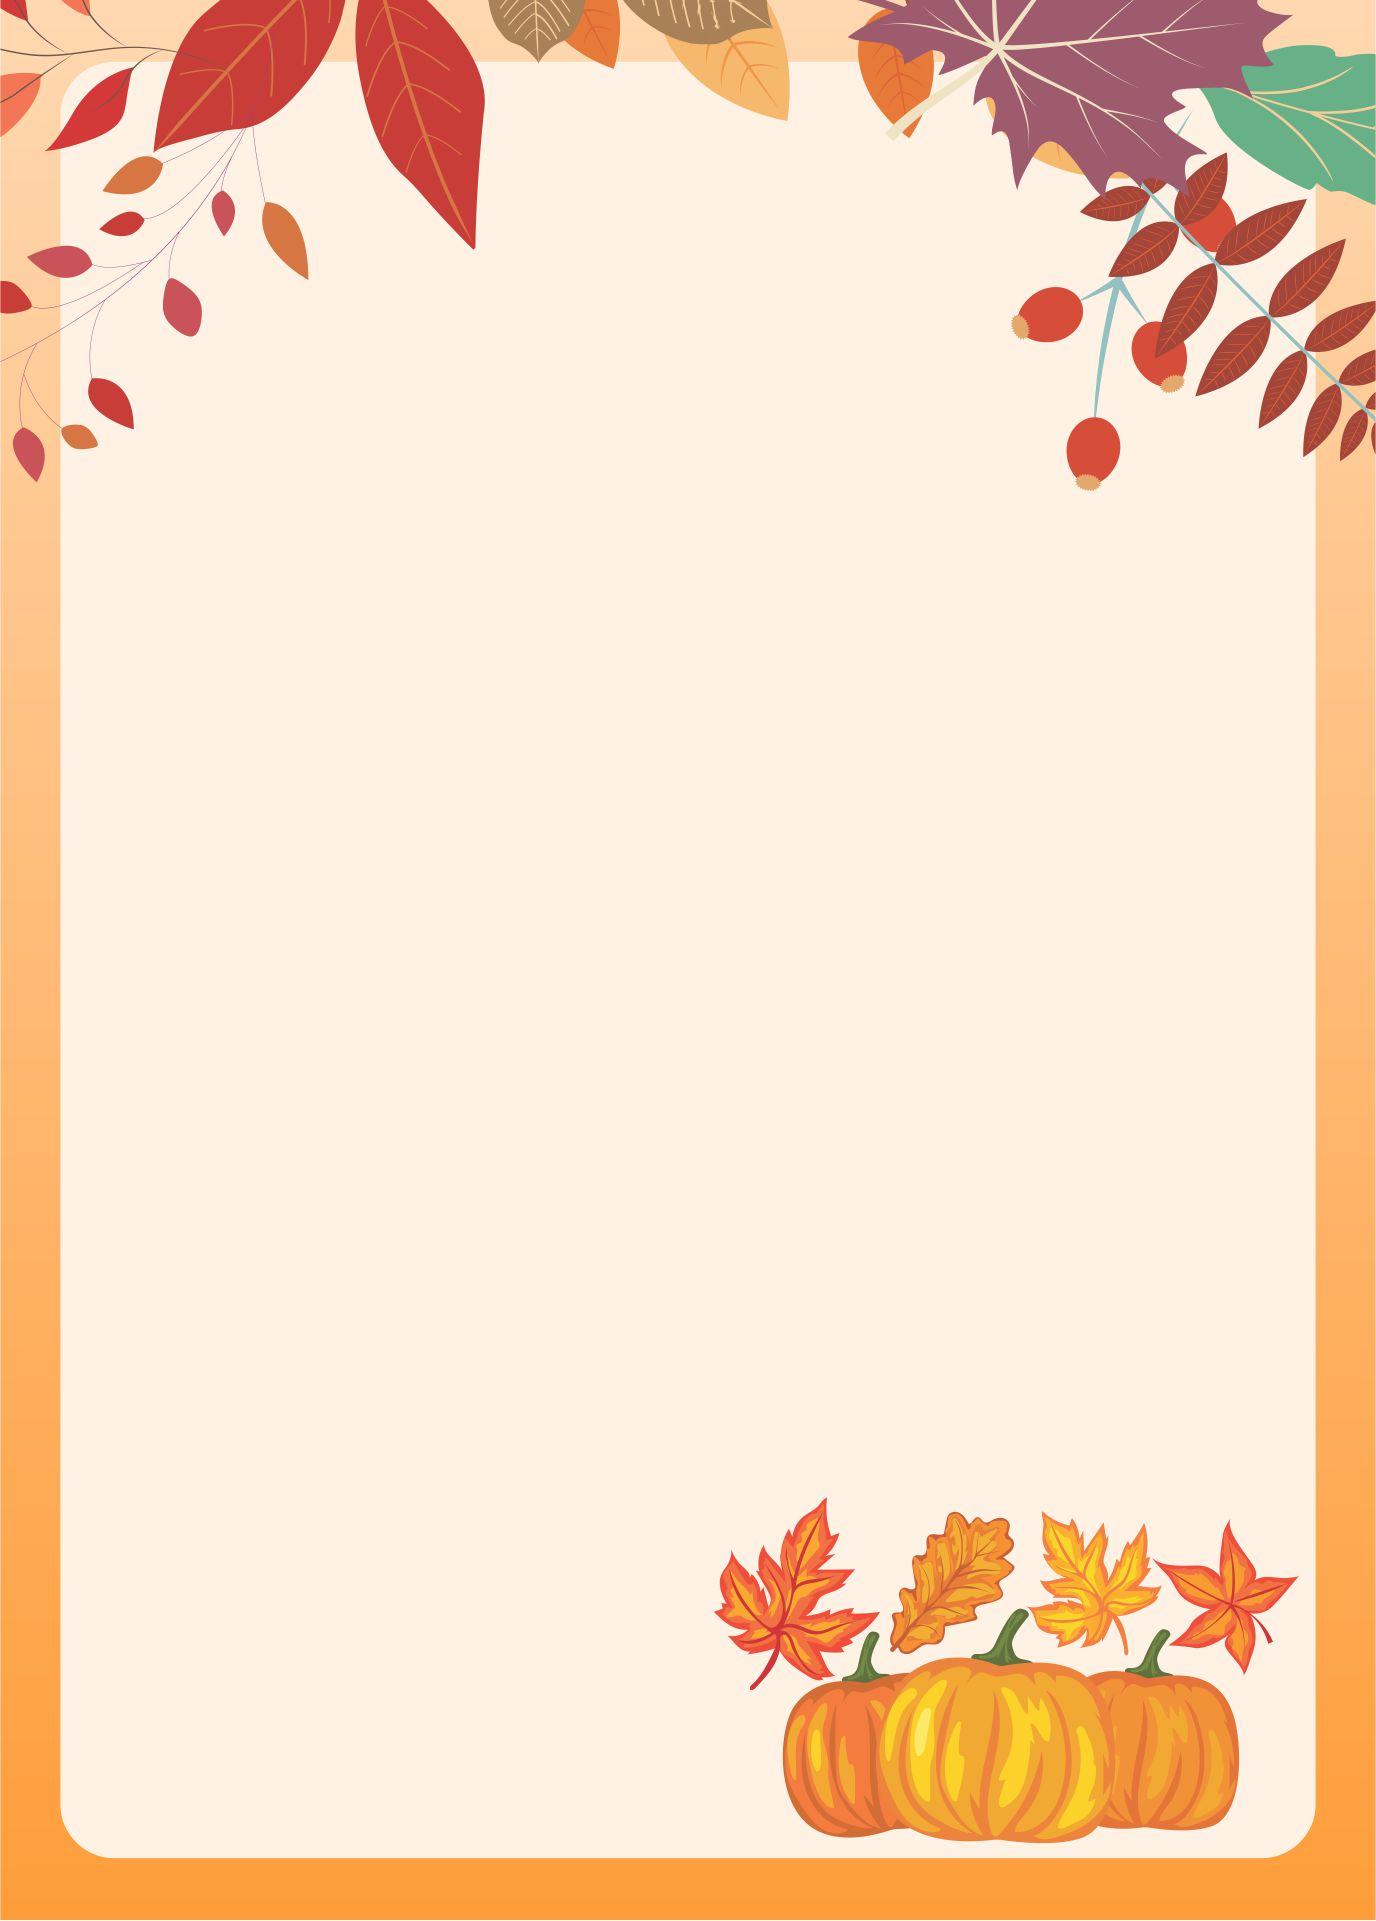 Printable Fall Stationery Borders